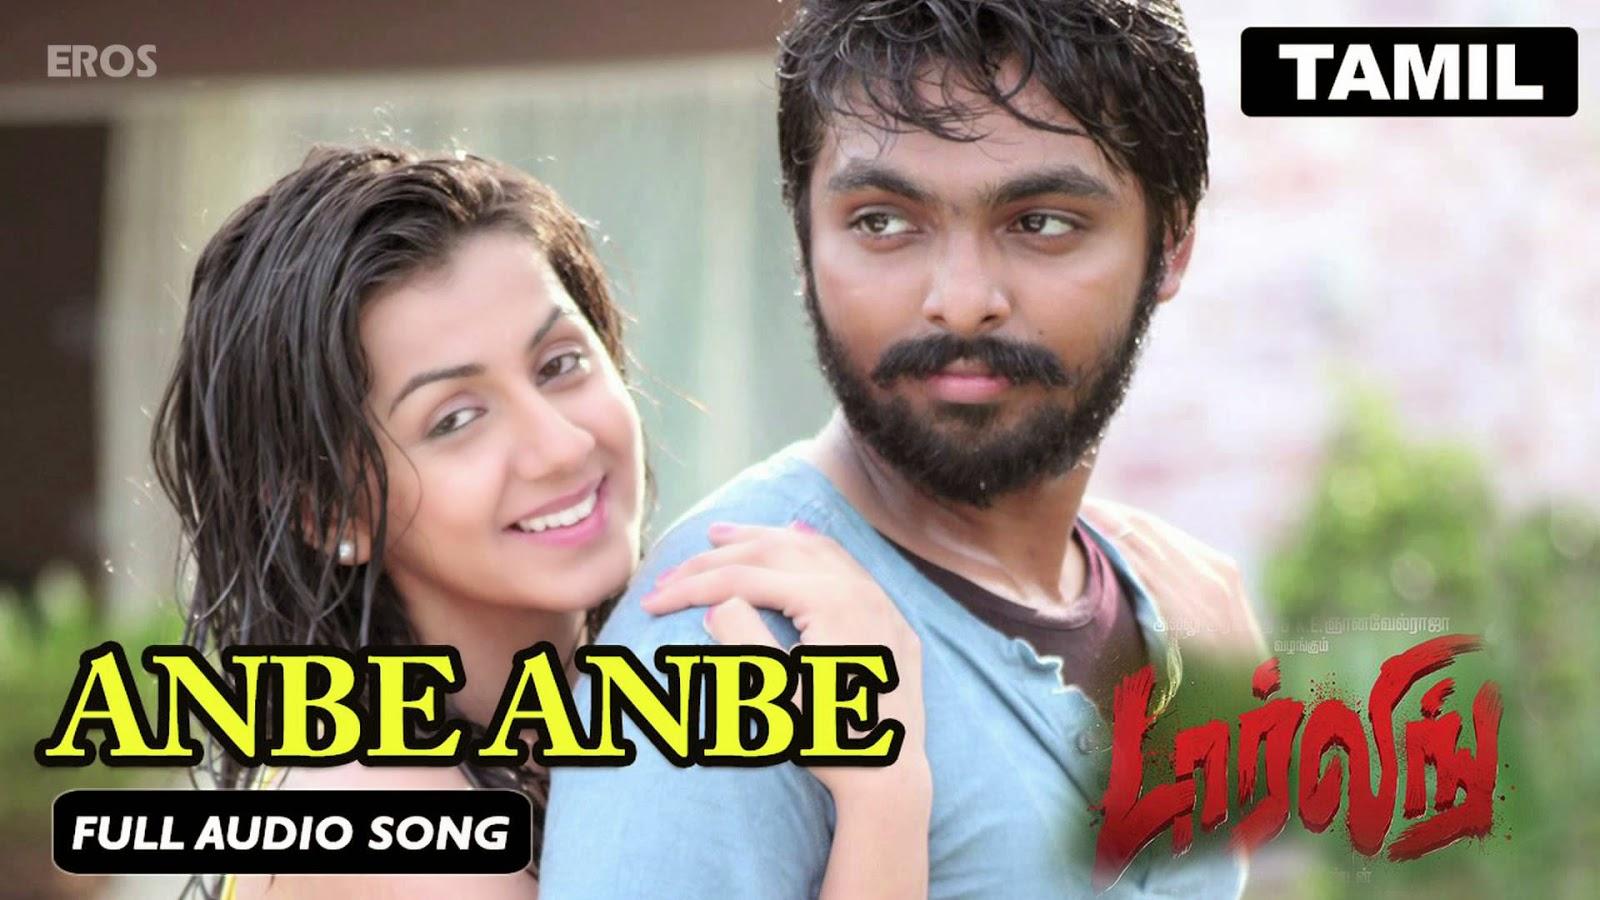 Malayalam movie darling darling songs